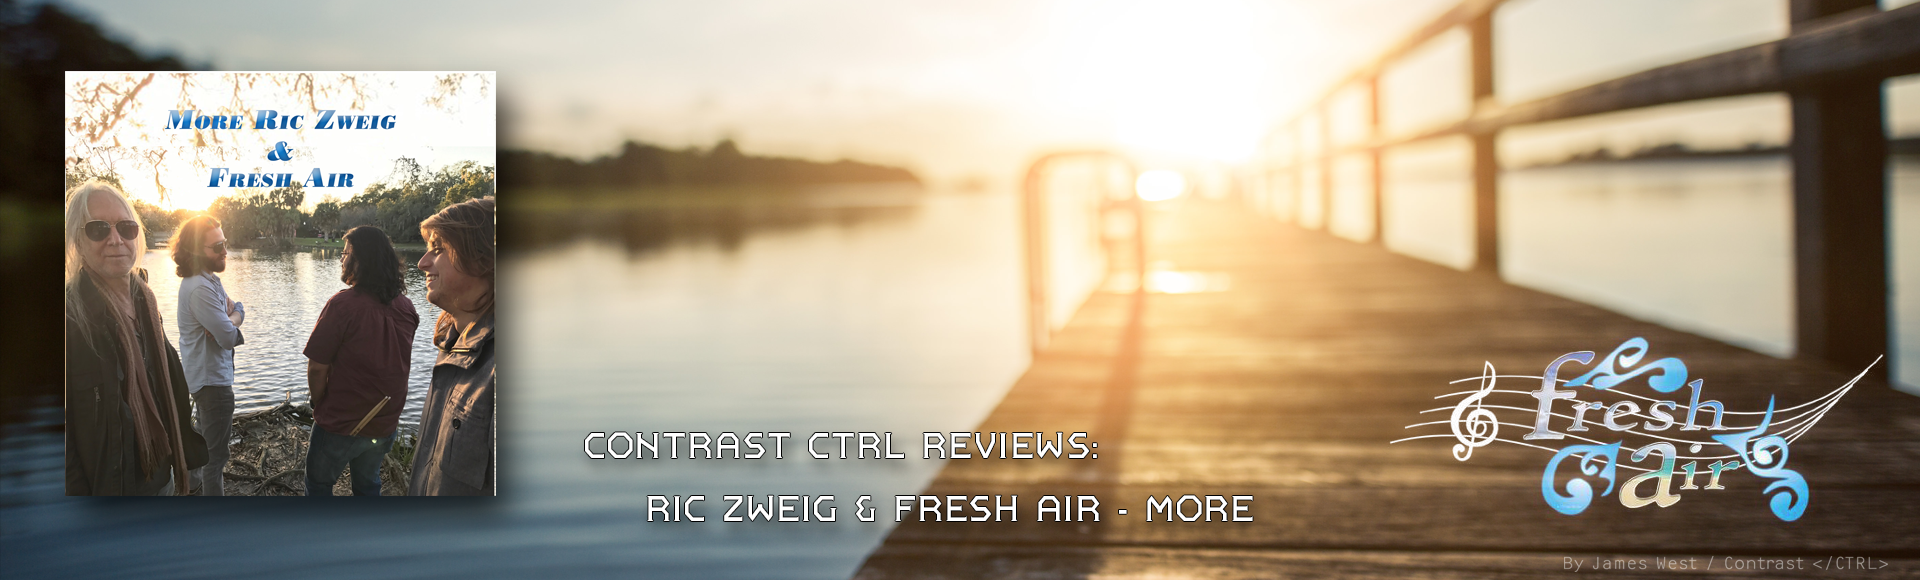 "Review Time: Ric Zweig & Fresh Air ""More"""